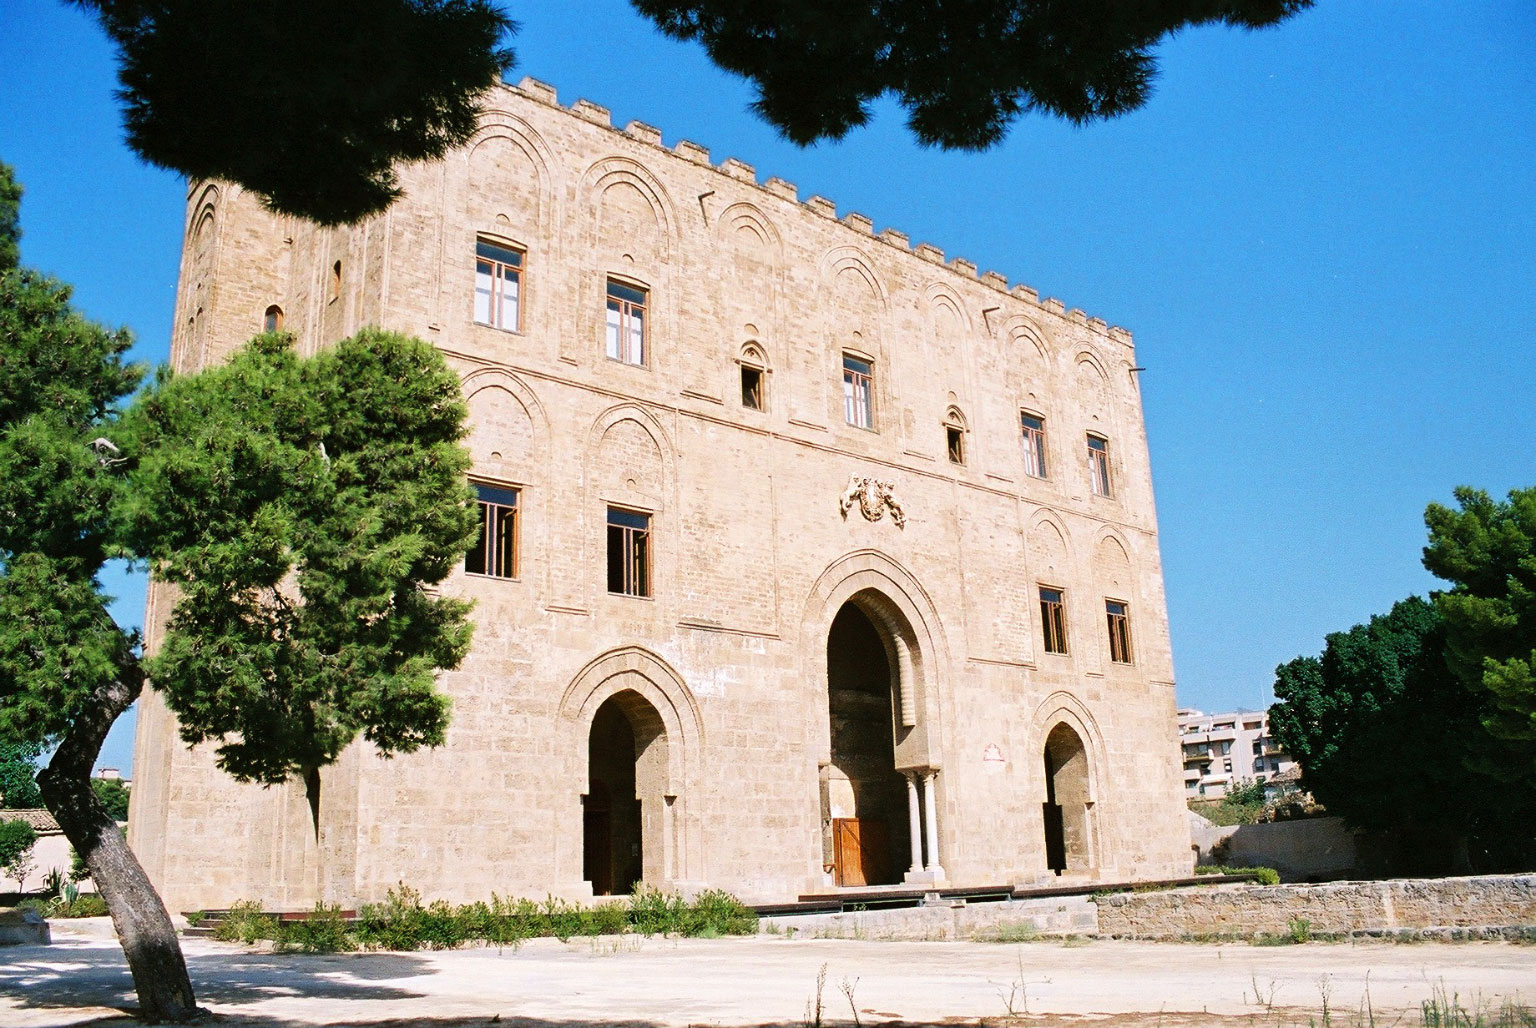 Palermo-Zisa-bjs-1.jpg